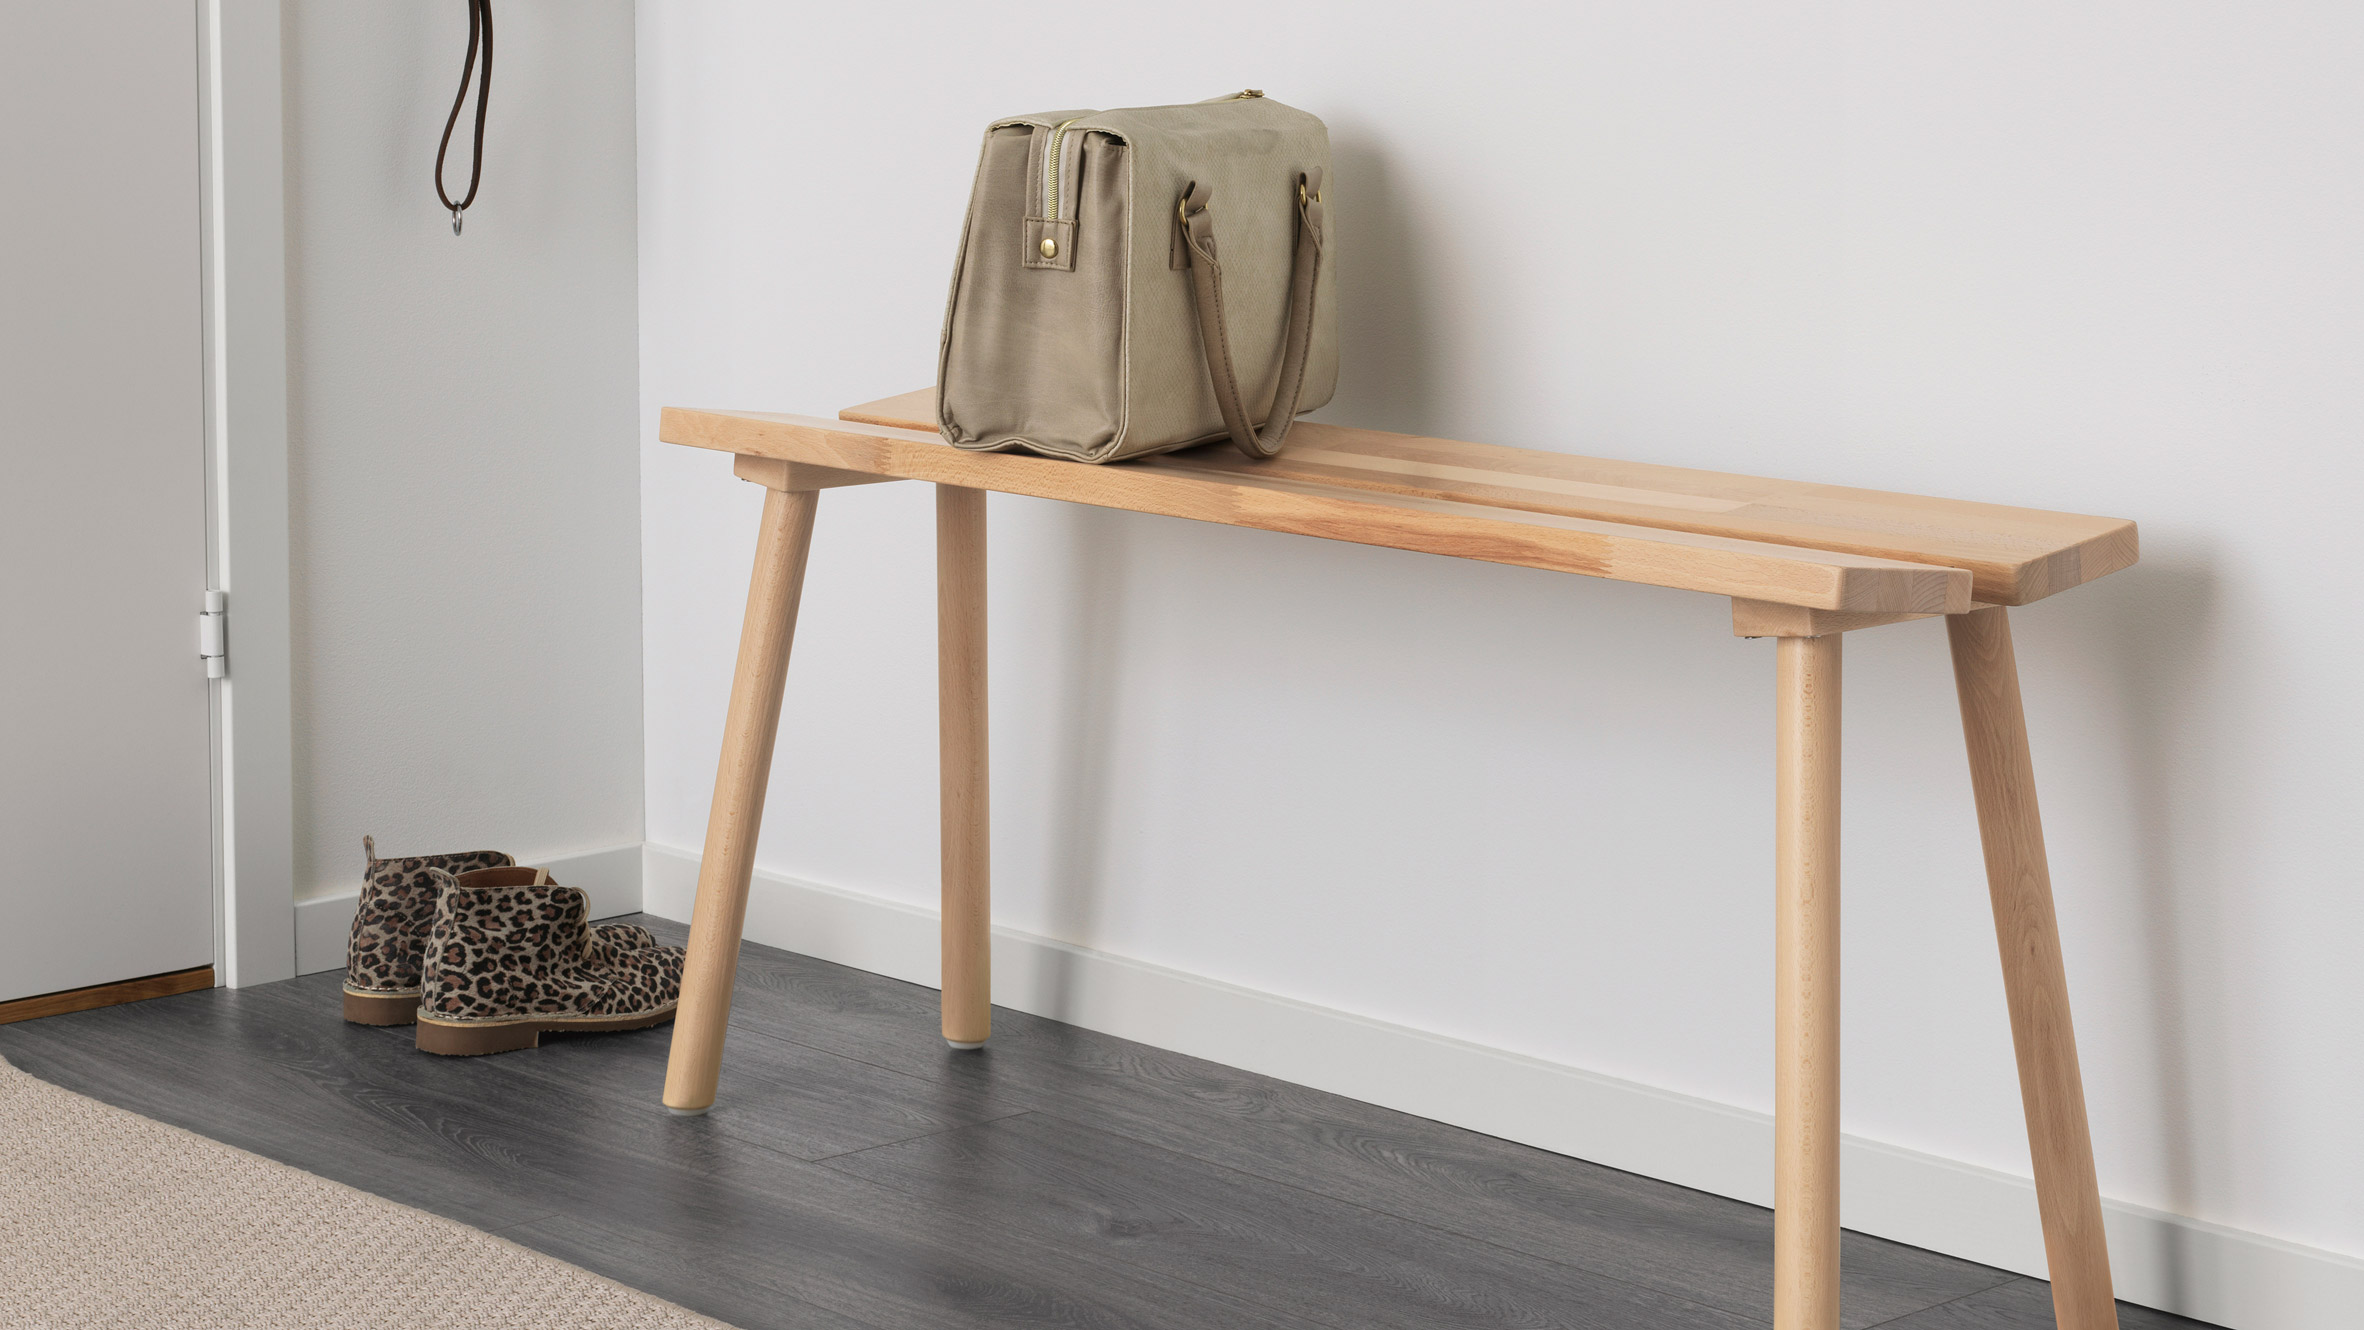 Ikea Bettsofa De Free try out of klippan 2 seat sofa from ikea in